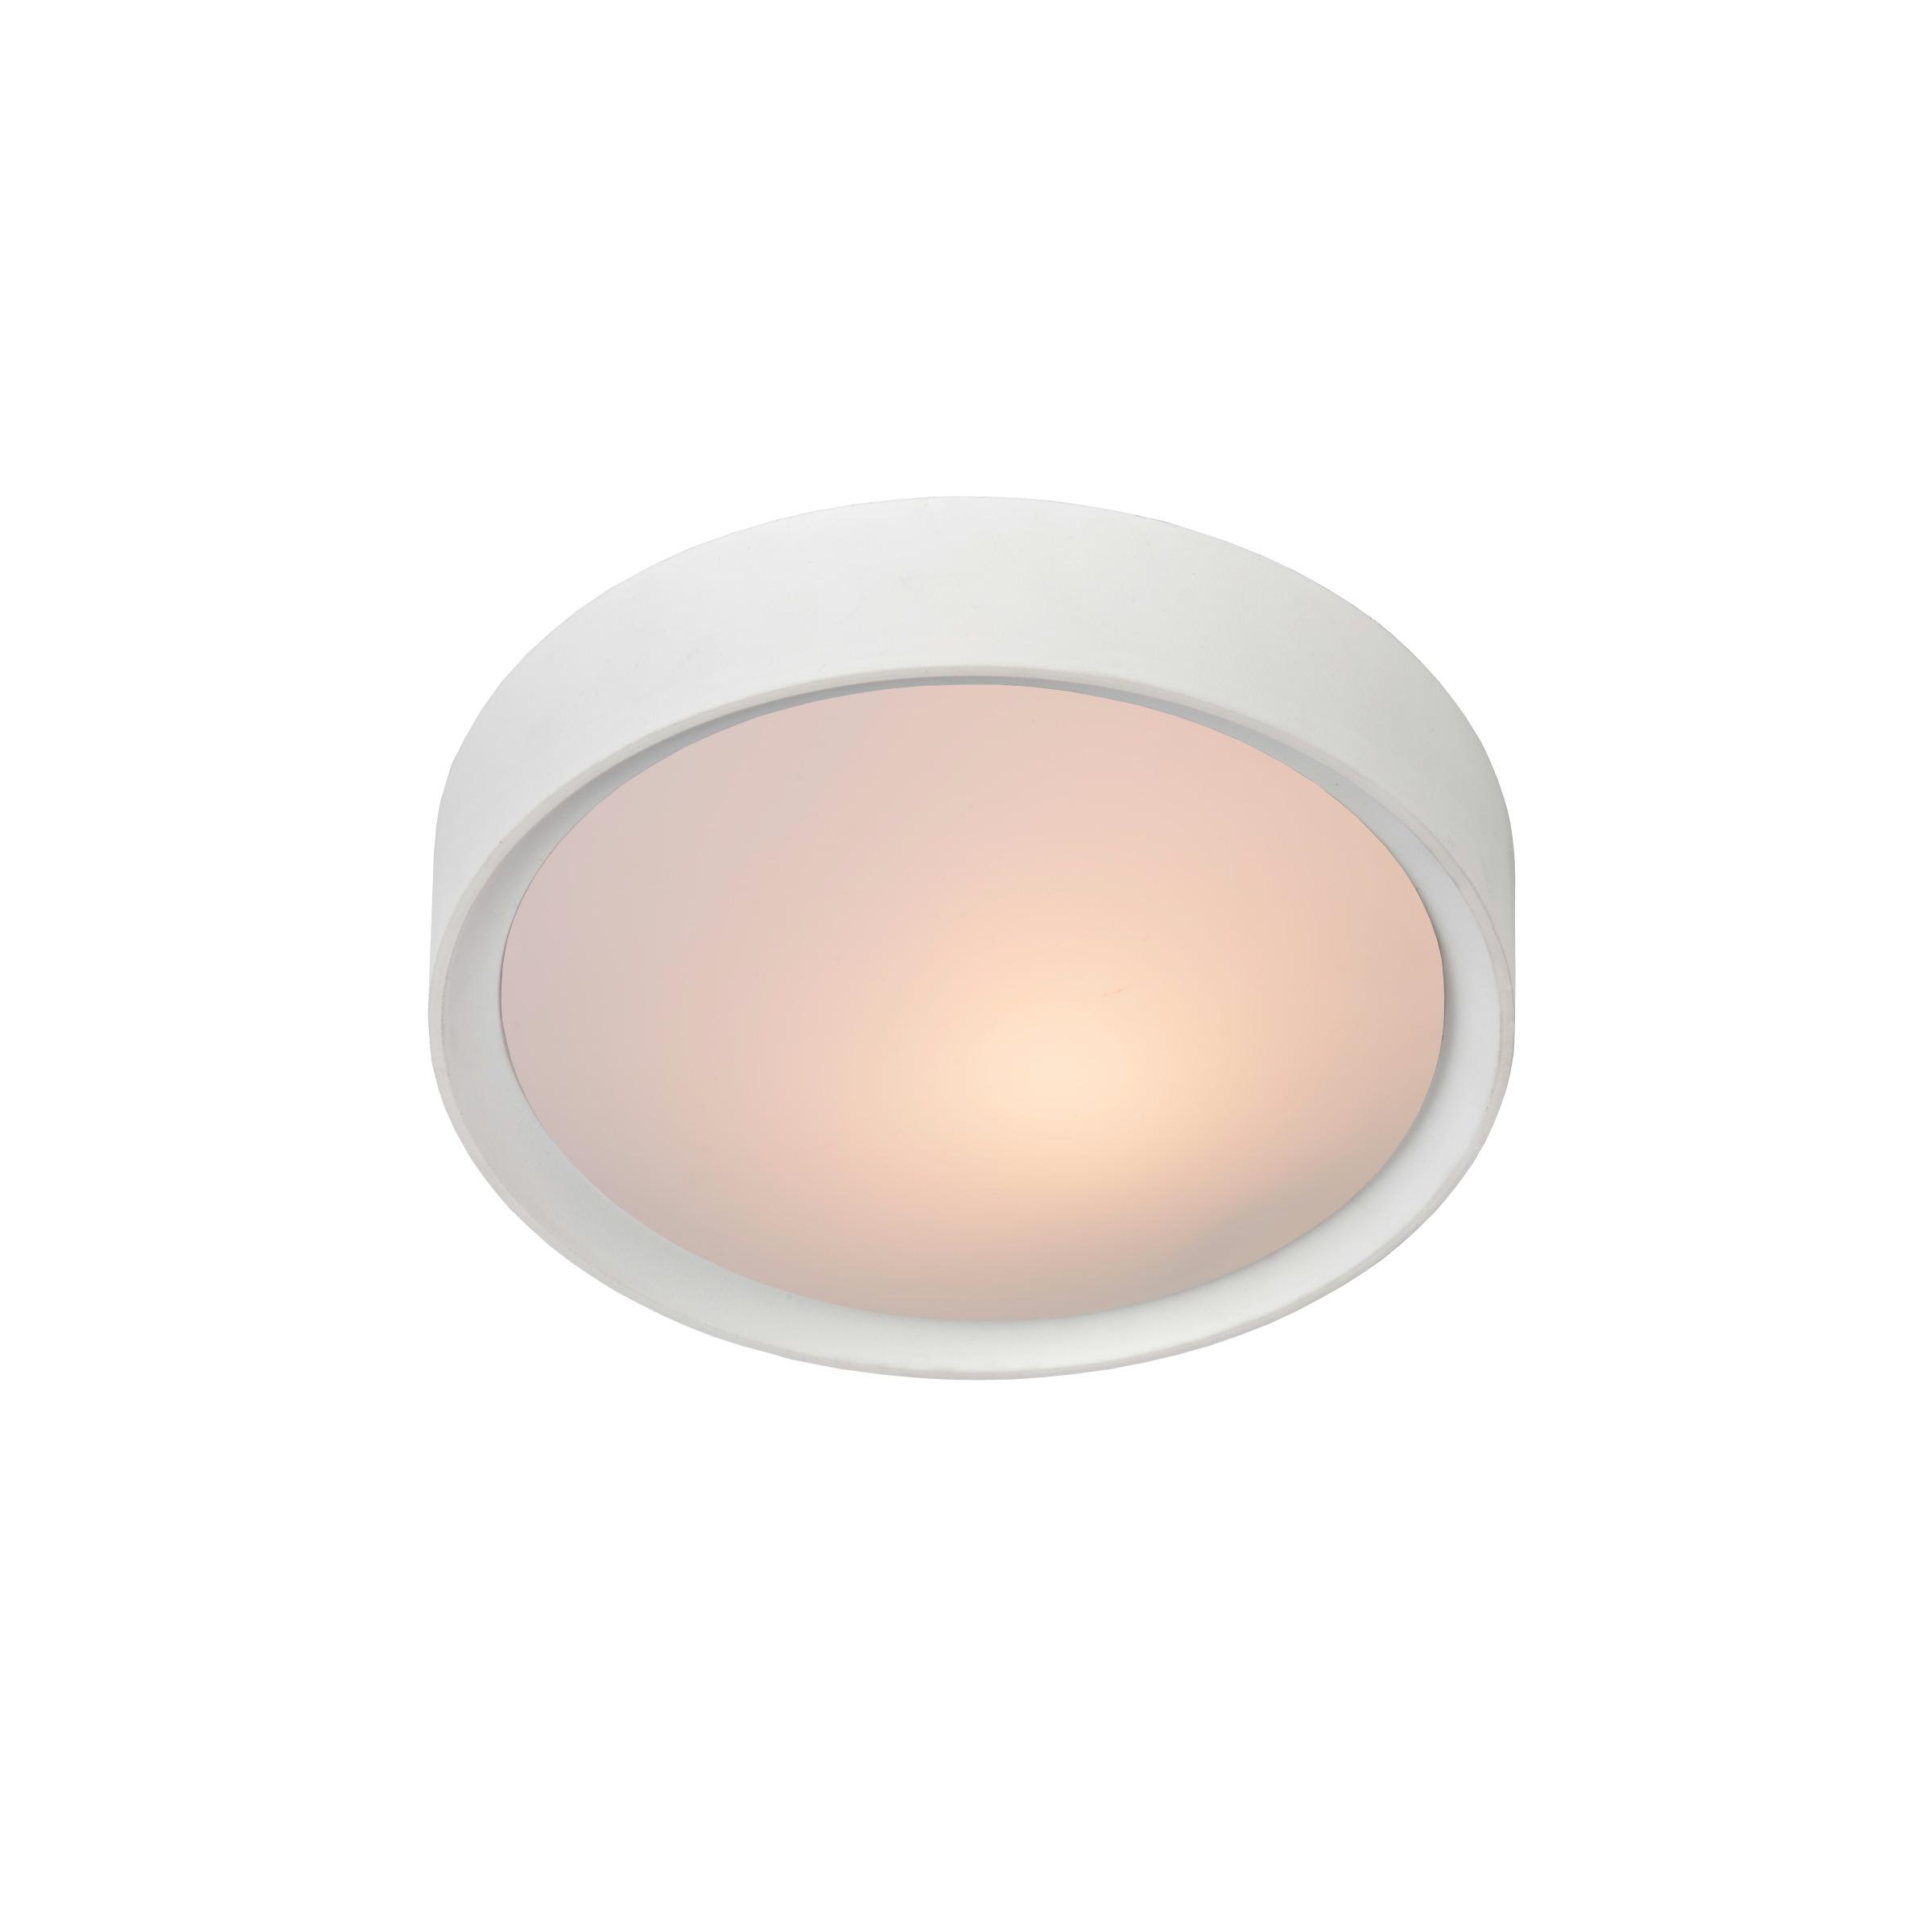 LEX Plafondlamp by Lucide 08109-01-31